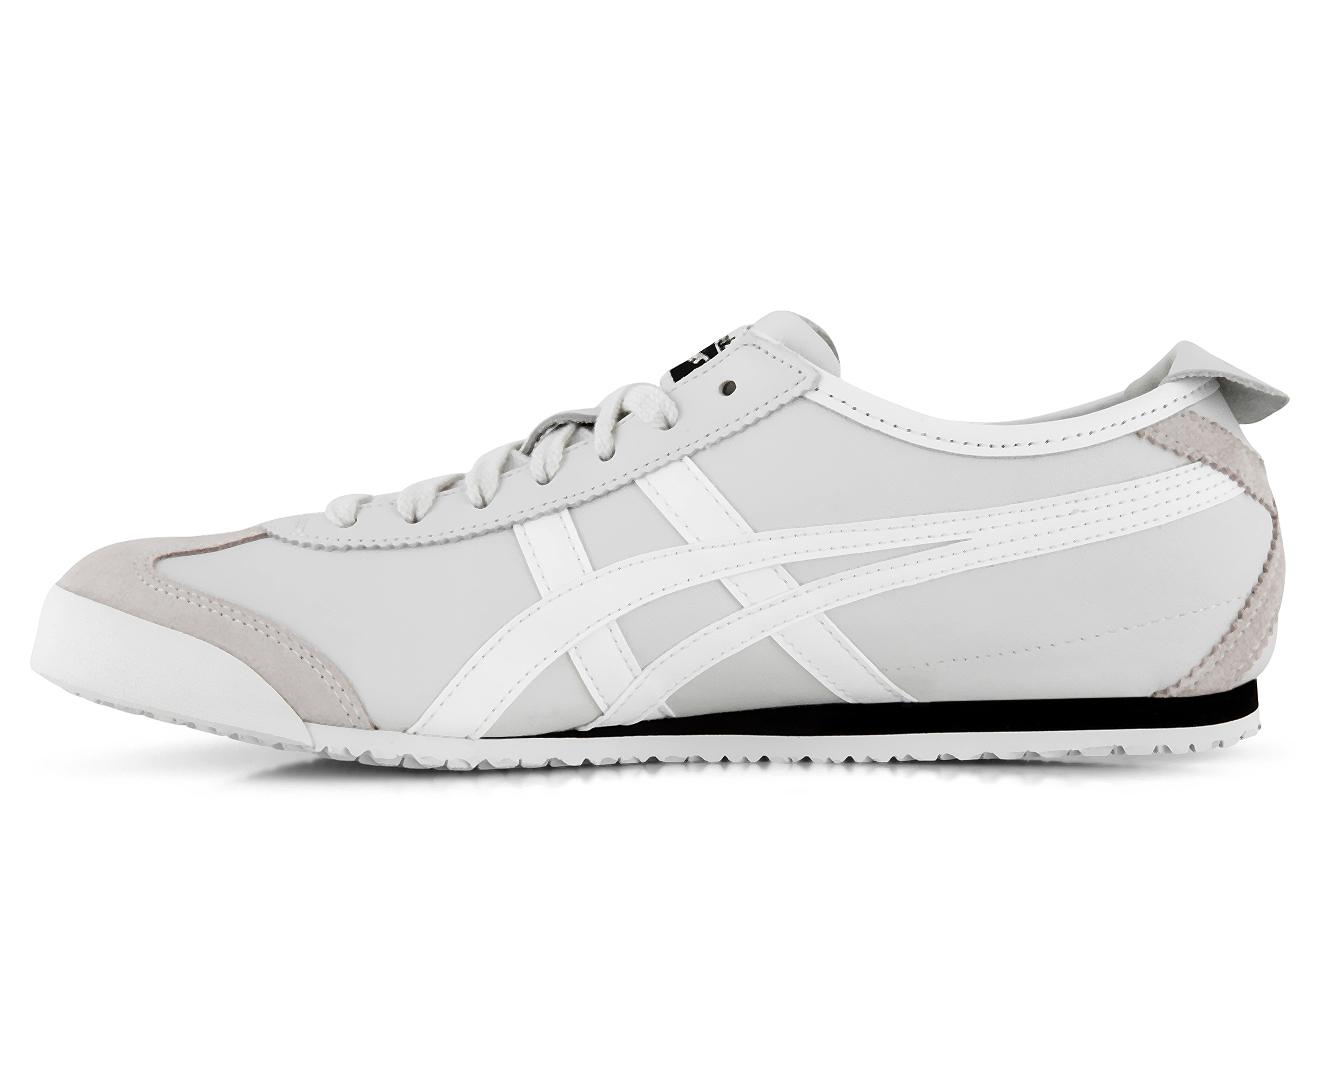 promo code cb03f 2c56d Onitsuka Tiger Men's Mexico 66 Shoe - Vaporous Grey/White